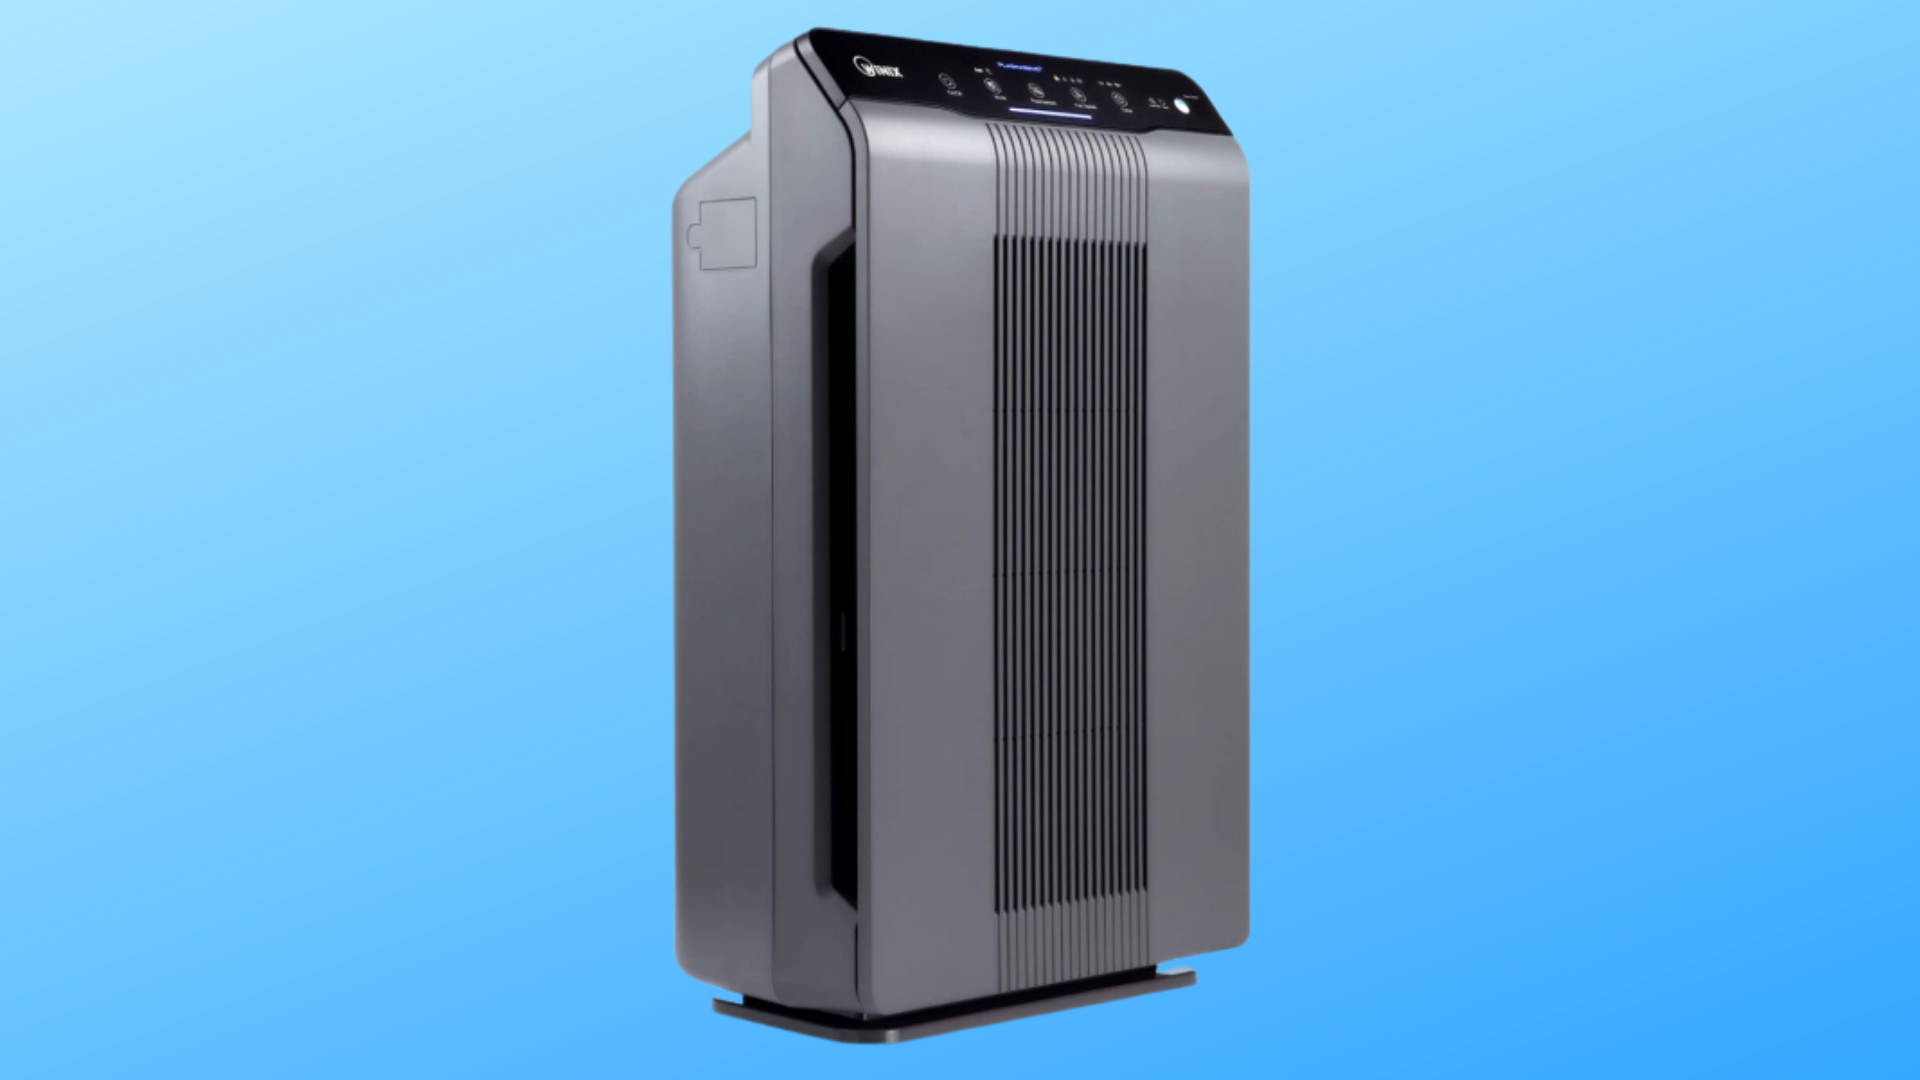 best air purifiers Winix 5300-2 Air Purifier best air purifier